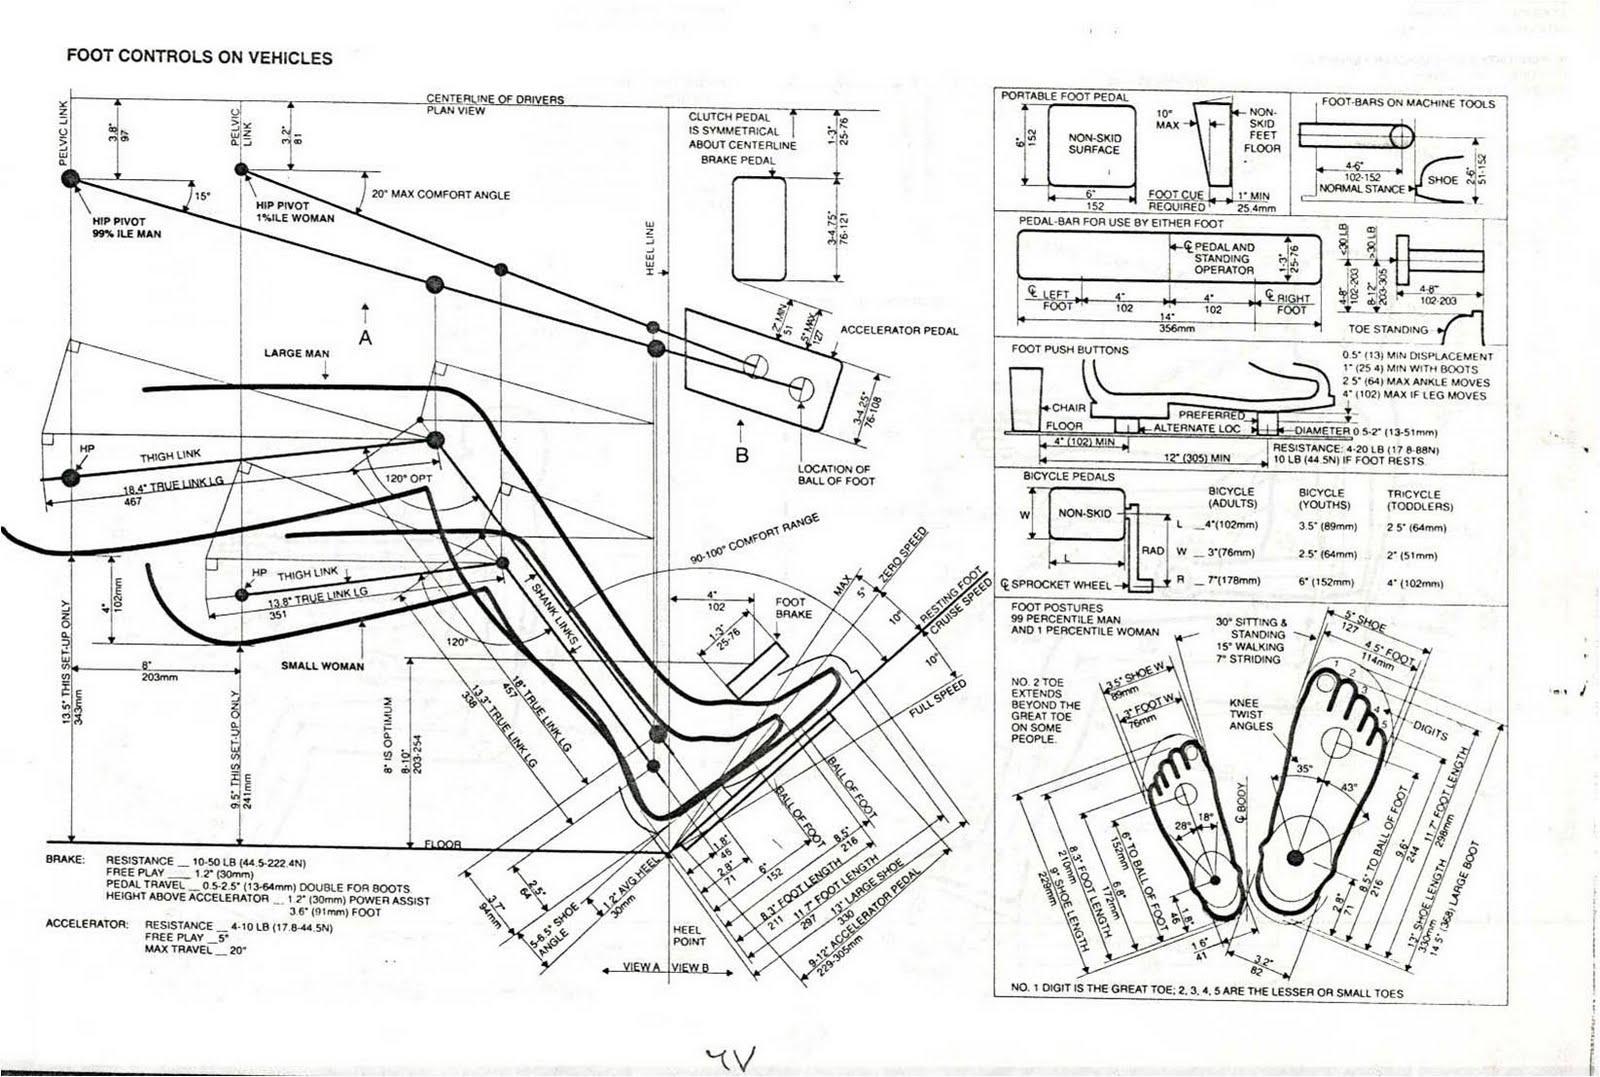 Automobile Comfort And Ergonomics Occupant Packaging